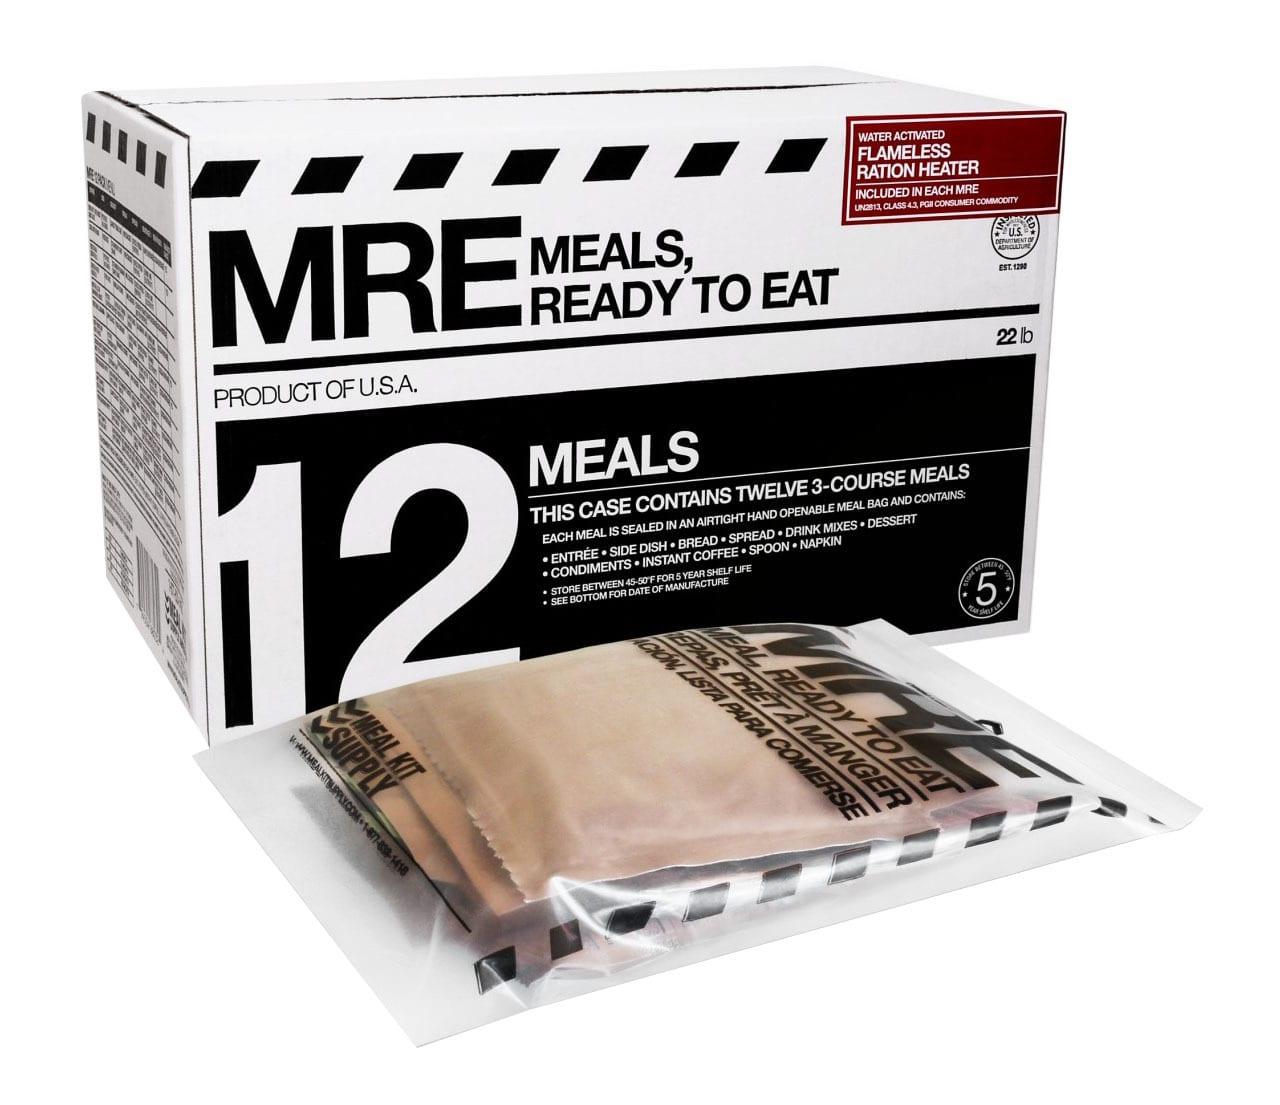 mre meals ready to eat 12 pack. Black Bedroom Furniture Sets. Home Design Ideas